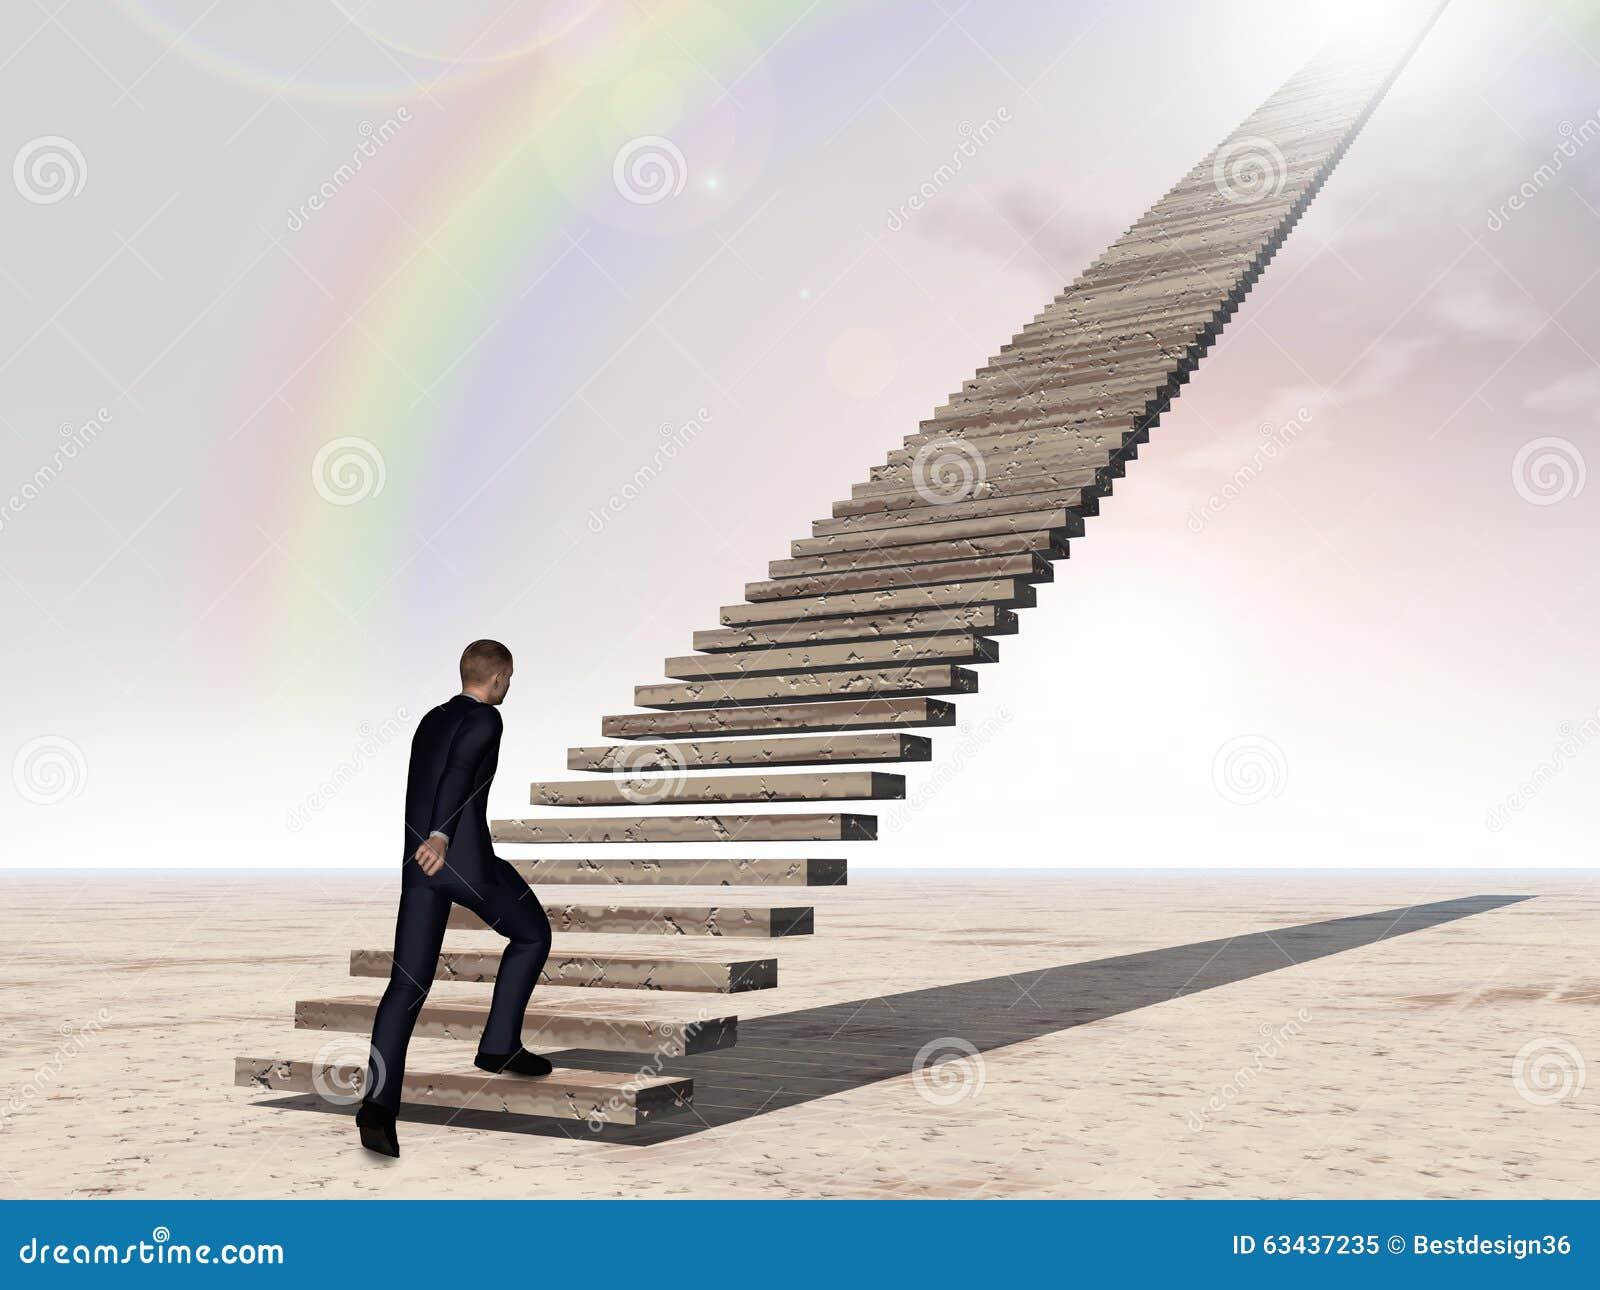 Escalera que camina o que sube del hombre de negocios conceptual 3D sobre el cielo del arco iris